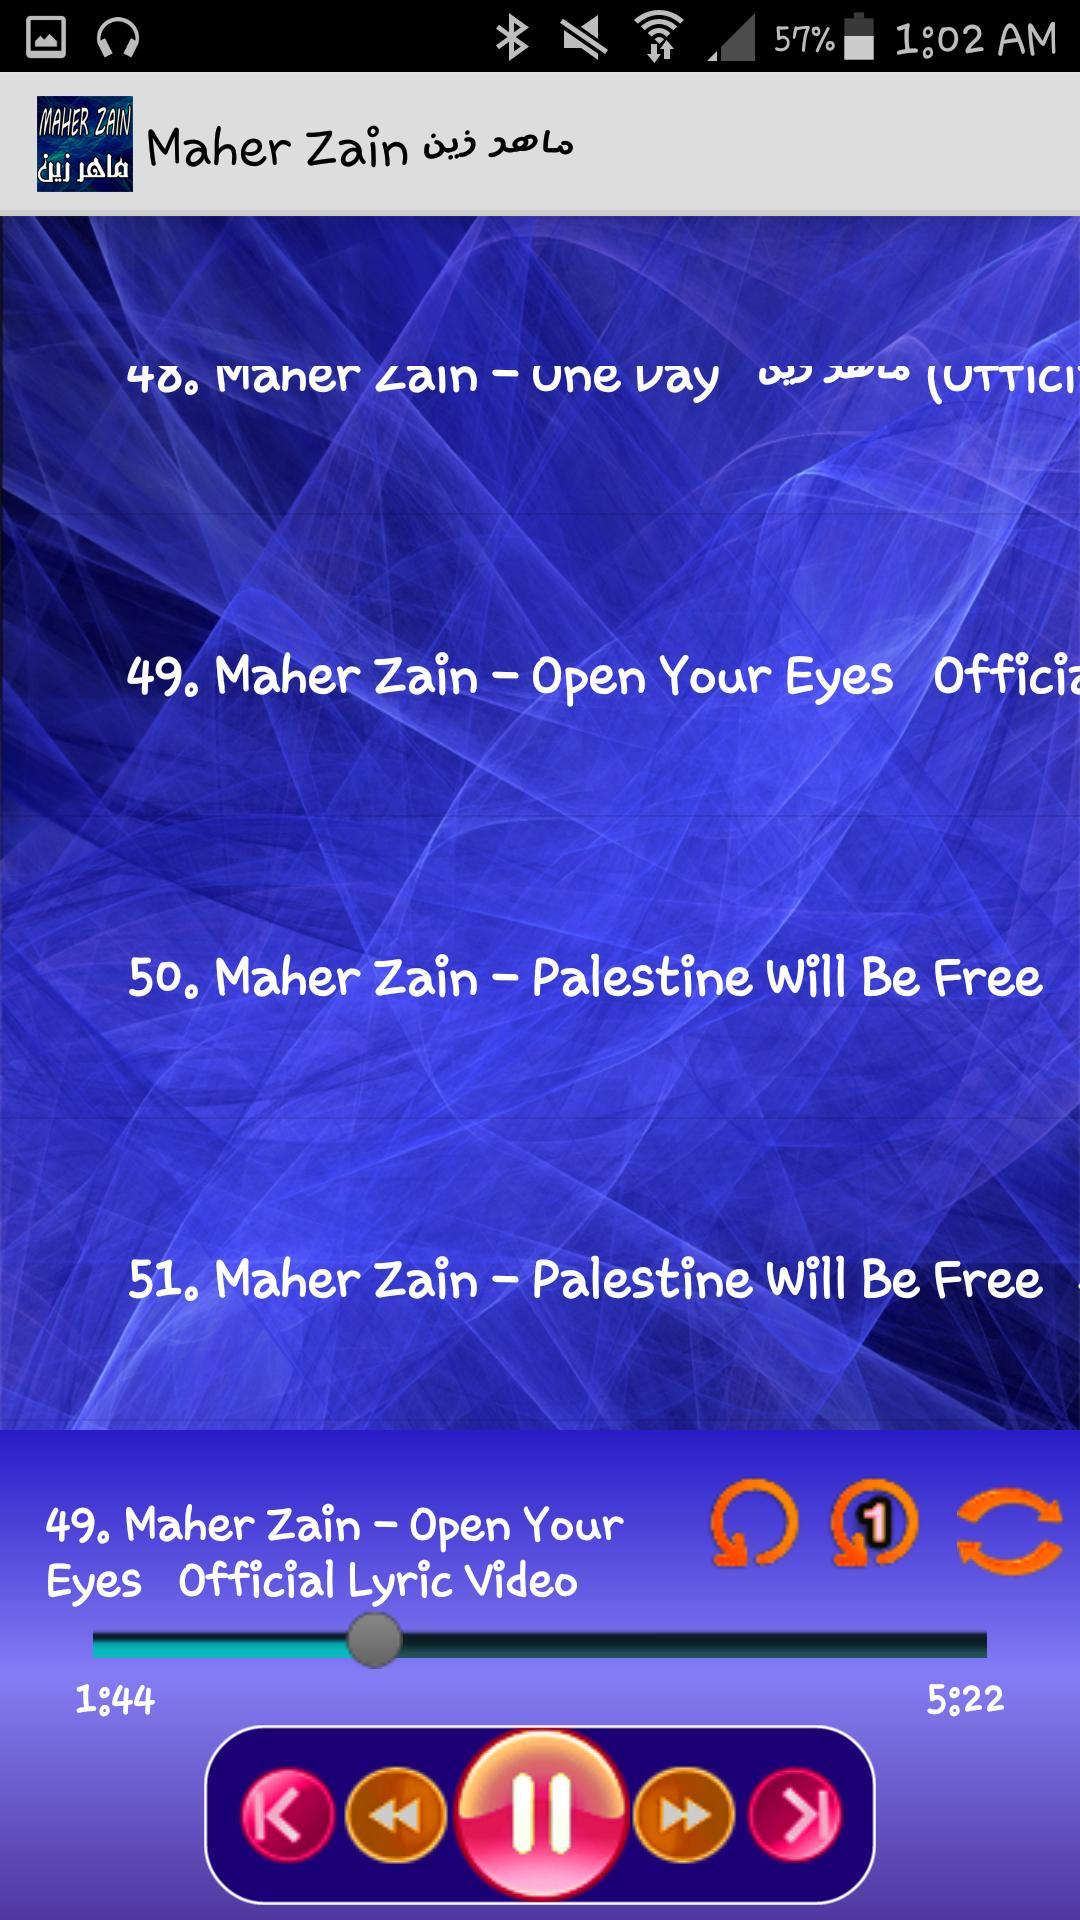 اناشيد ماهر زين Maher Zain mp3 for Android - APK Download